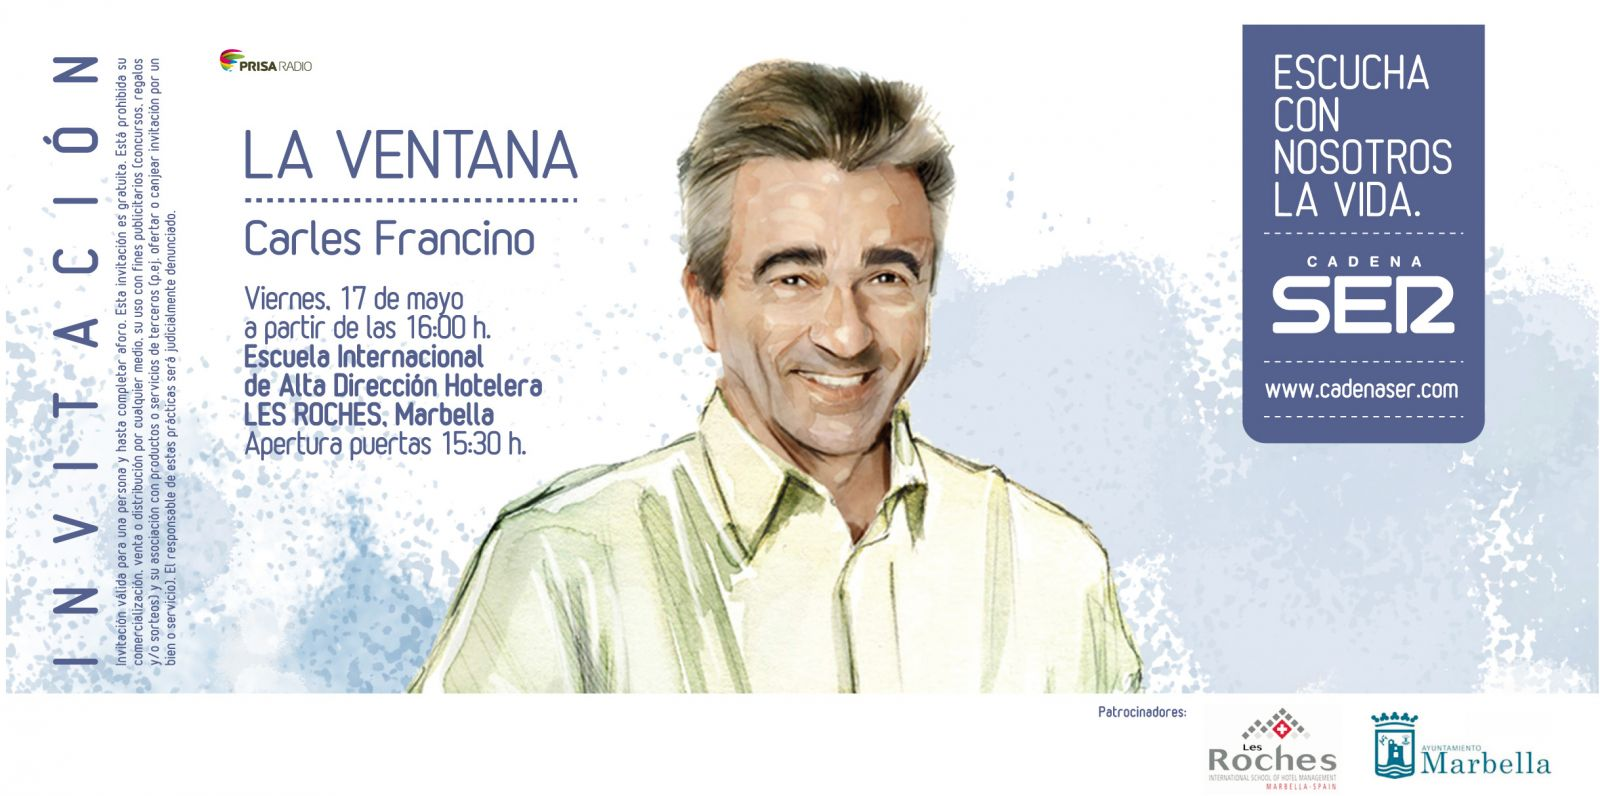 Les roches marbella anfitriona del programa notas de prensa for Cadena ser francino